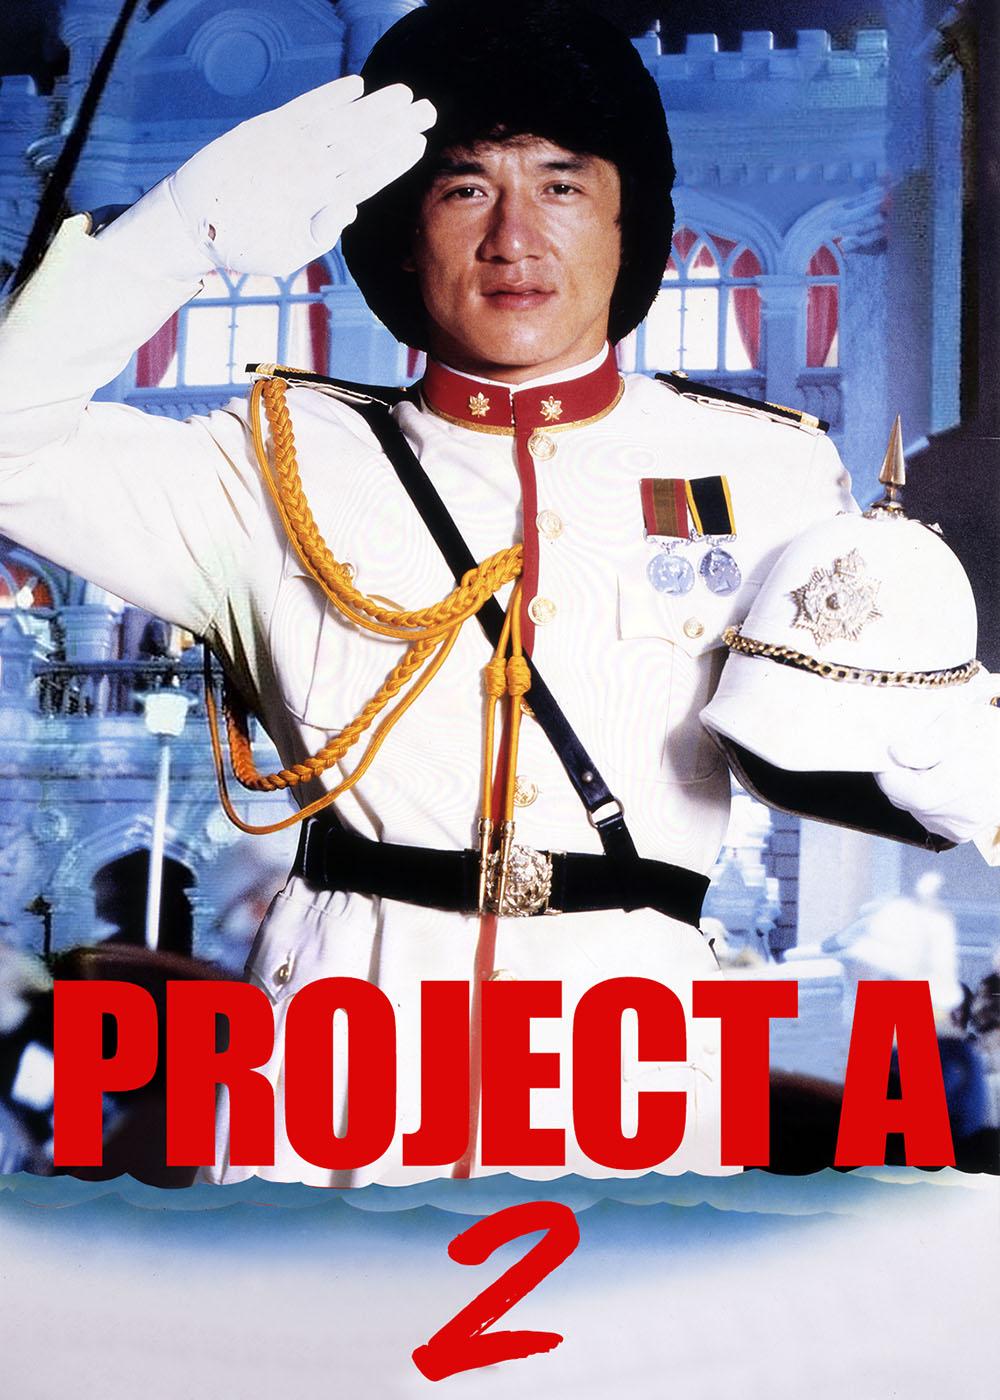 projecta2_poster.jpg